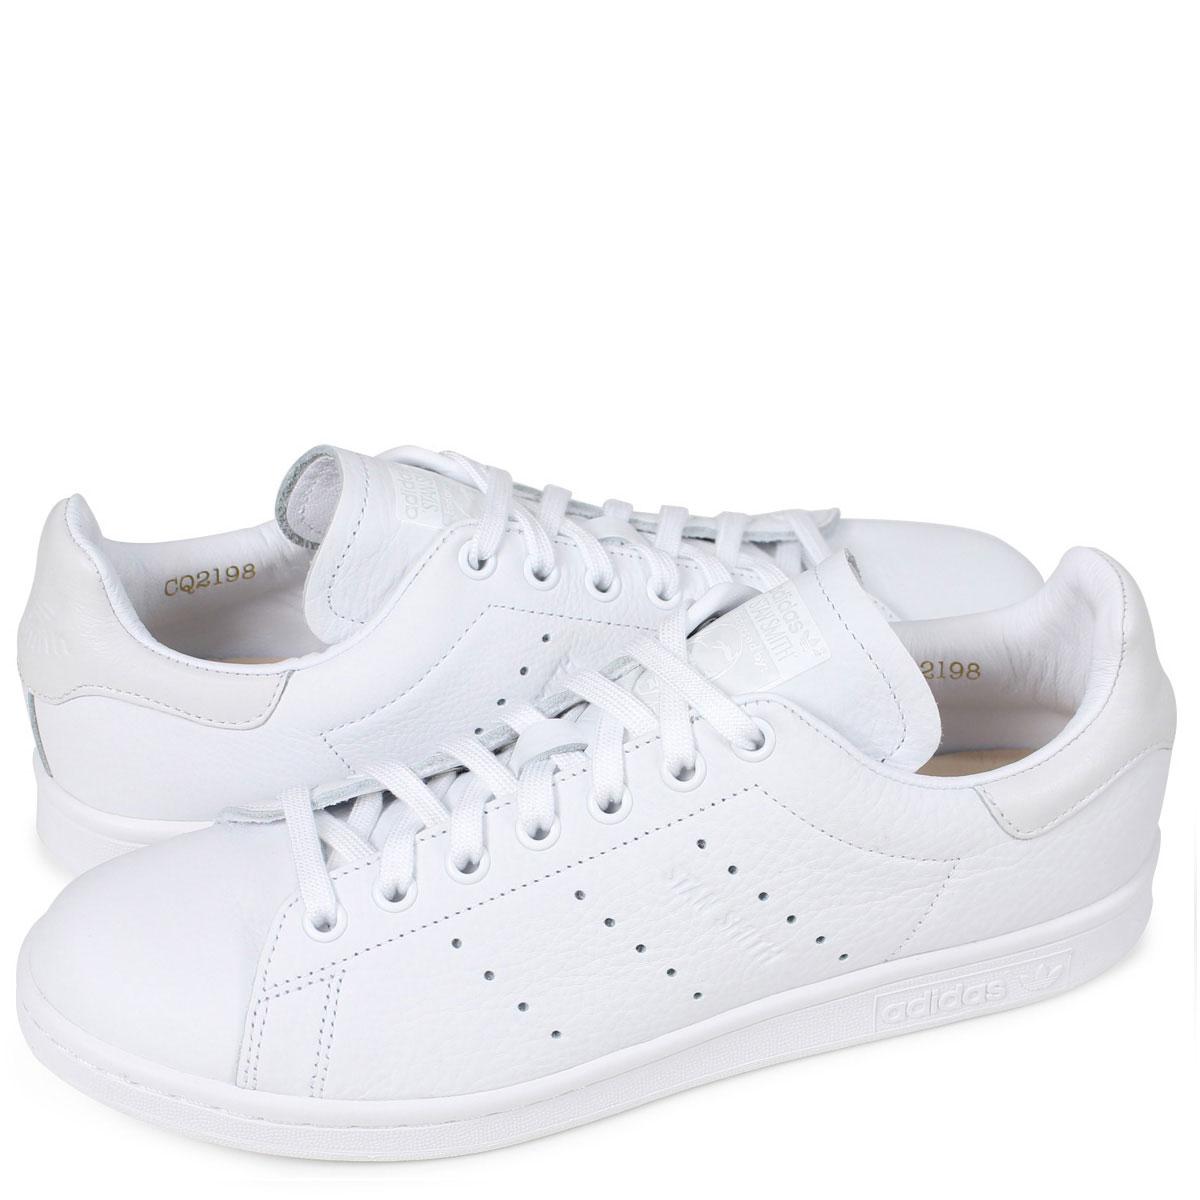 new arrivals 4b265 67bcf adidas Originals STAN SMITH Adidas Stan Smith sneakers men gap Dis CQ2198  white originals [4/17 Shinnyu load]